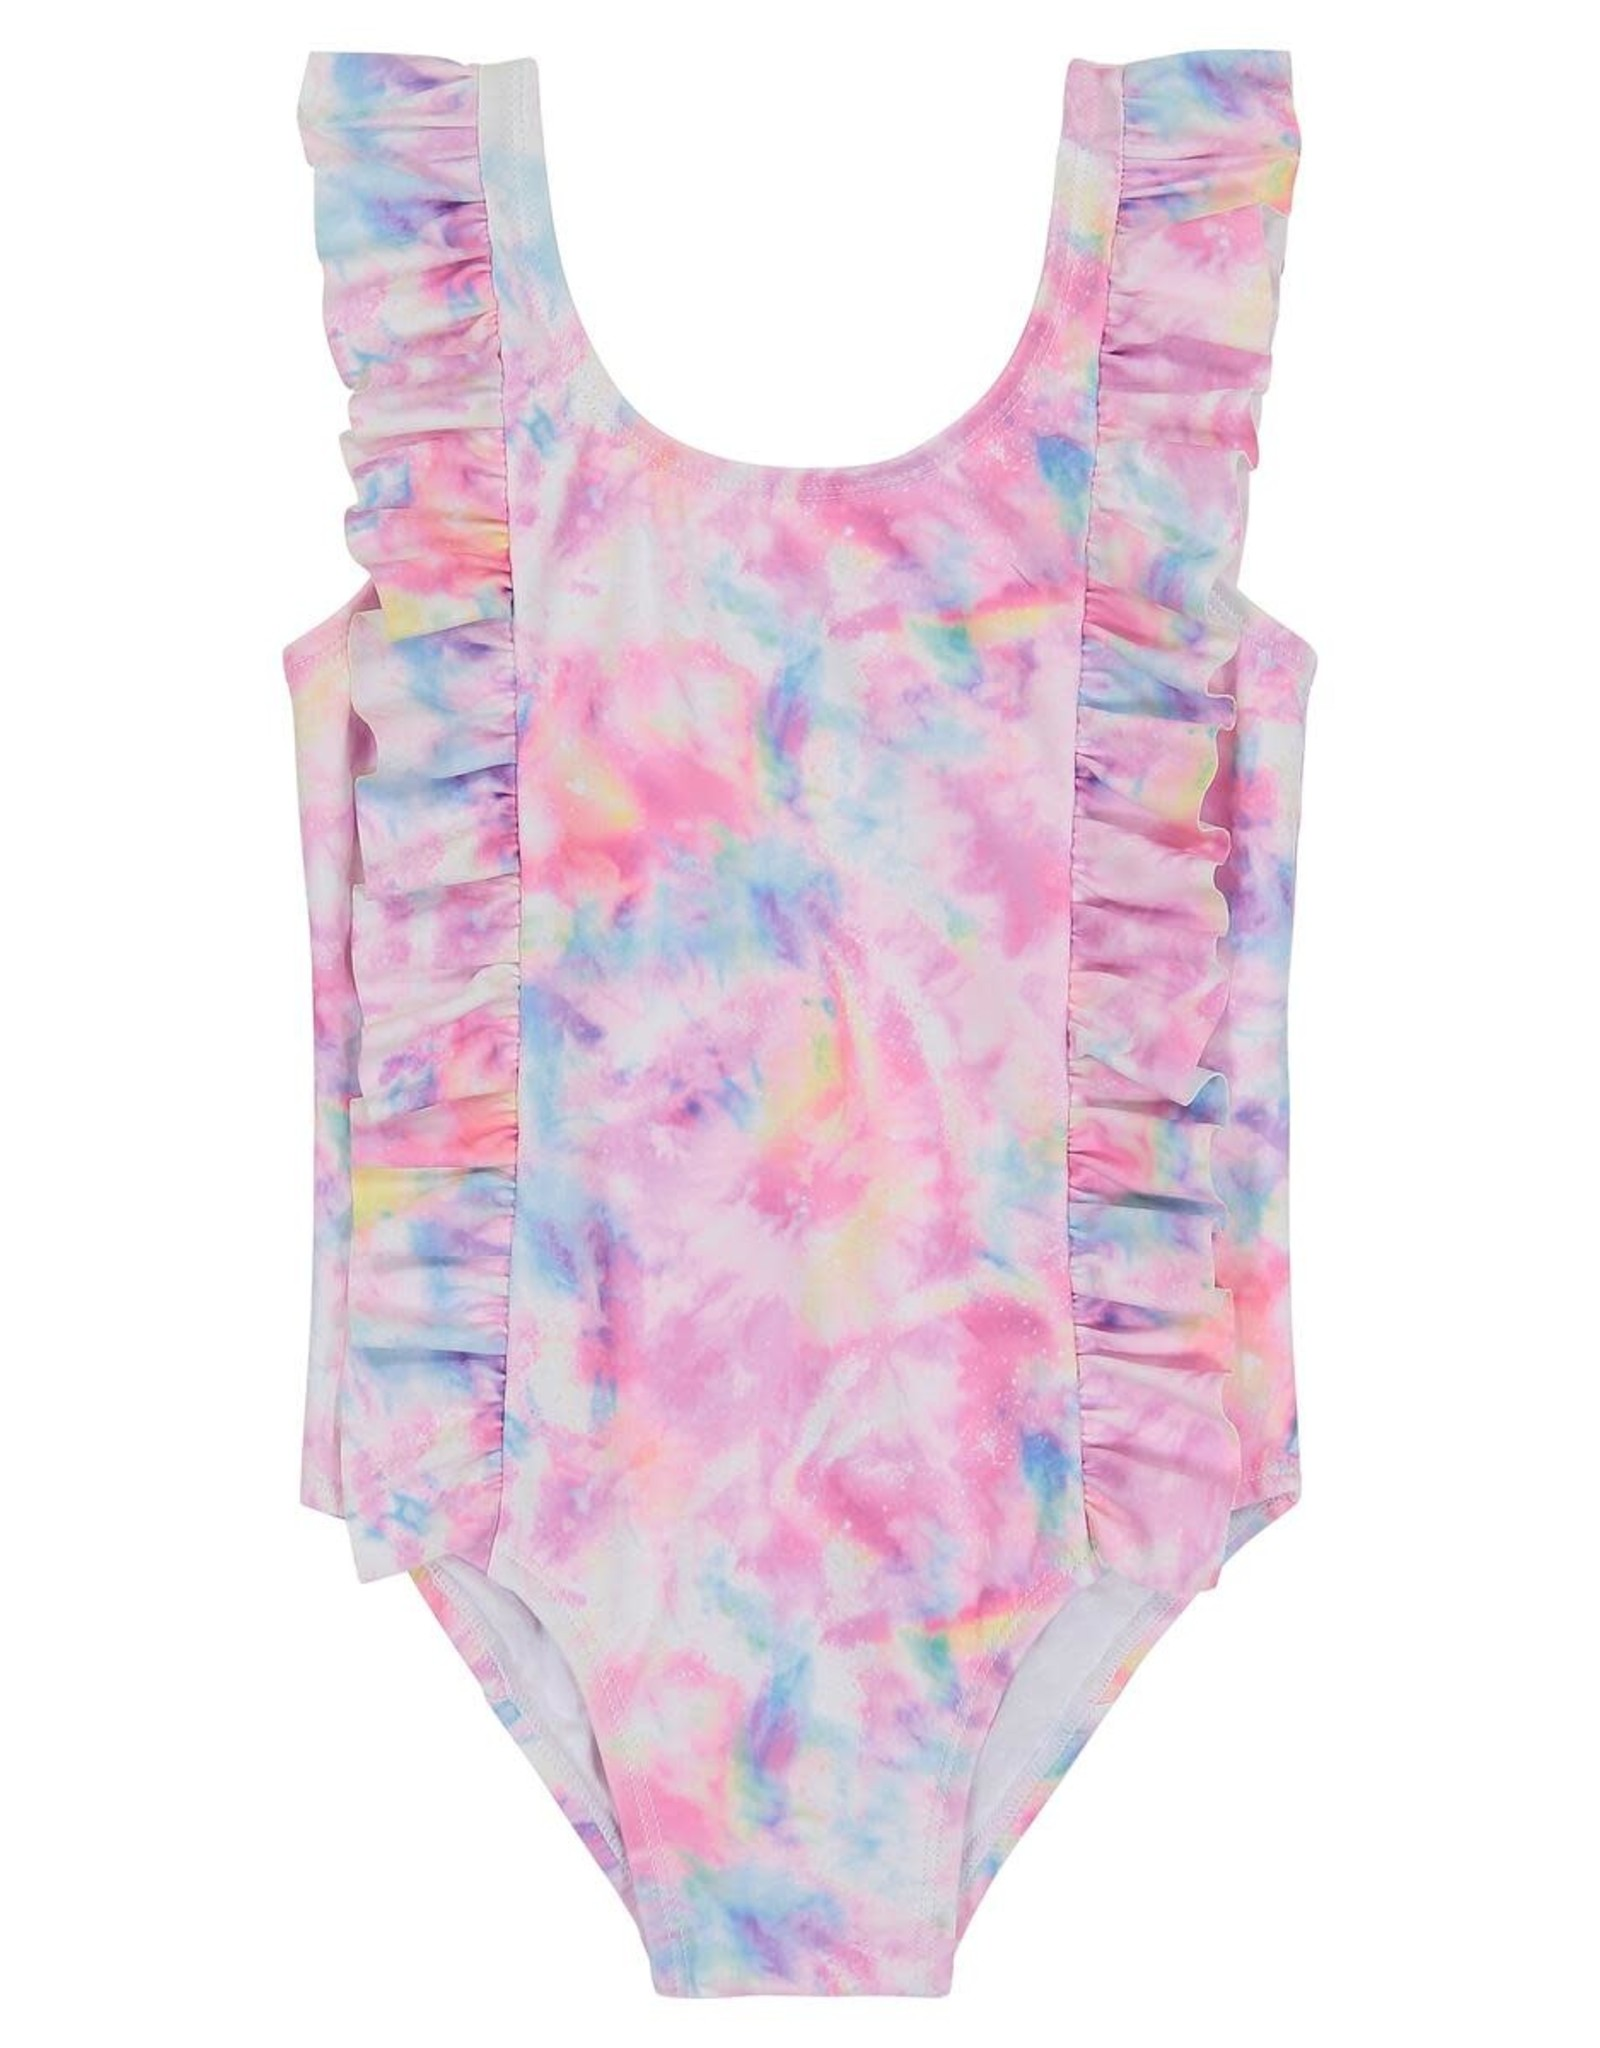 Andy & Evan Andy & Evan Ruffle Baby Swimsuit, Tie Dye